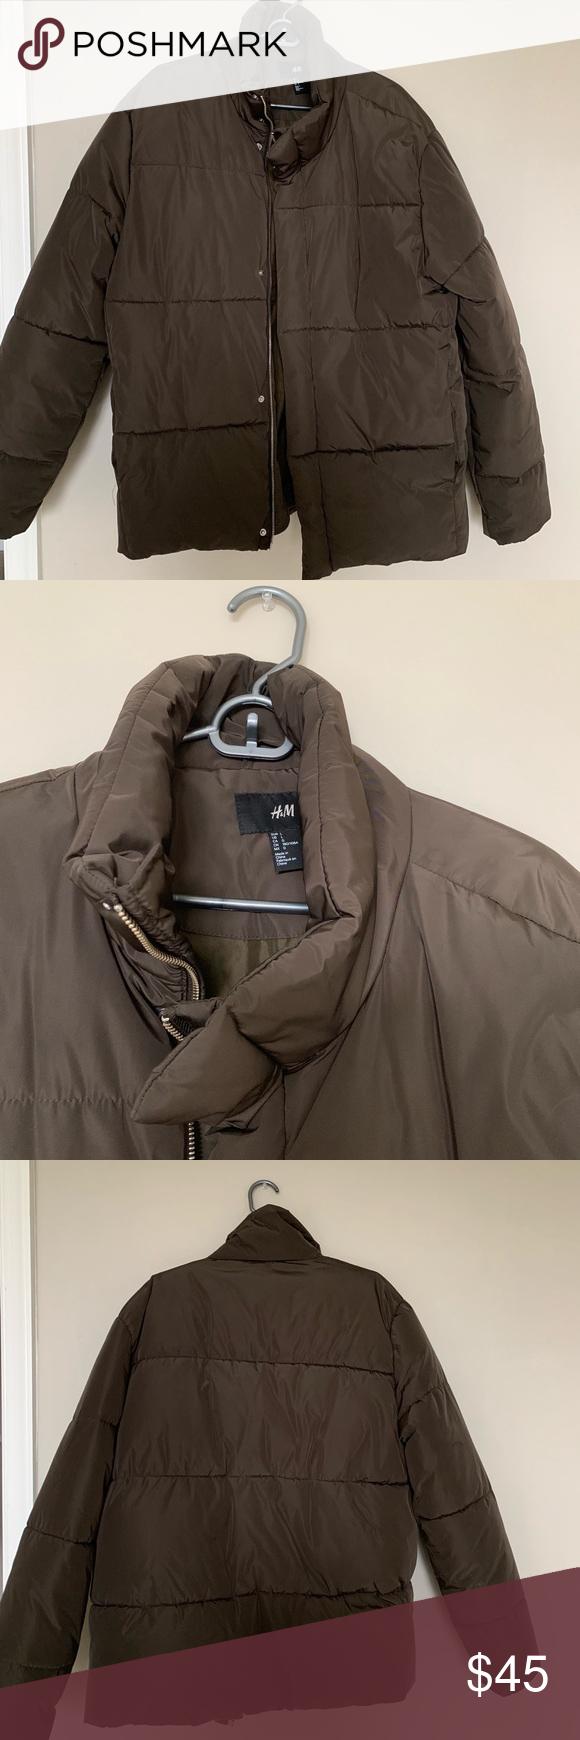 Men's Brown Puffer Coat H&M Puffer coat, Fashion